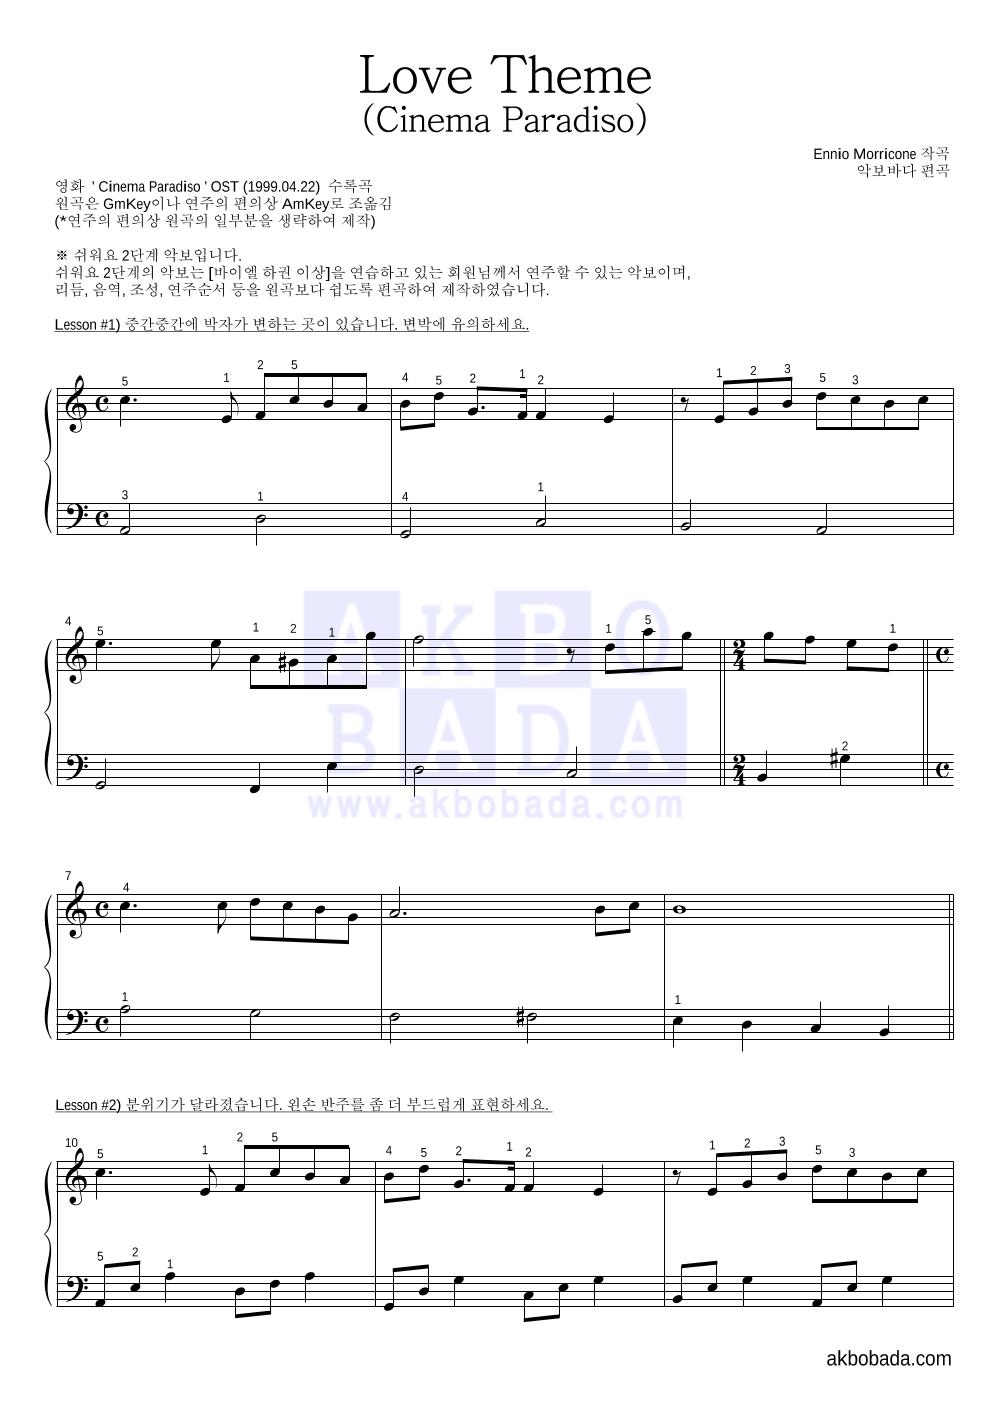 Ennio Morricone - Love Theme (Cinema Paradiso) 피아노2단-쉬워요 악보